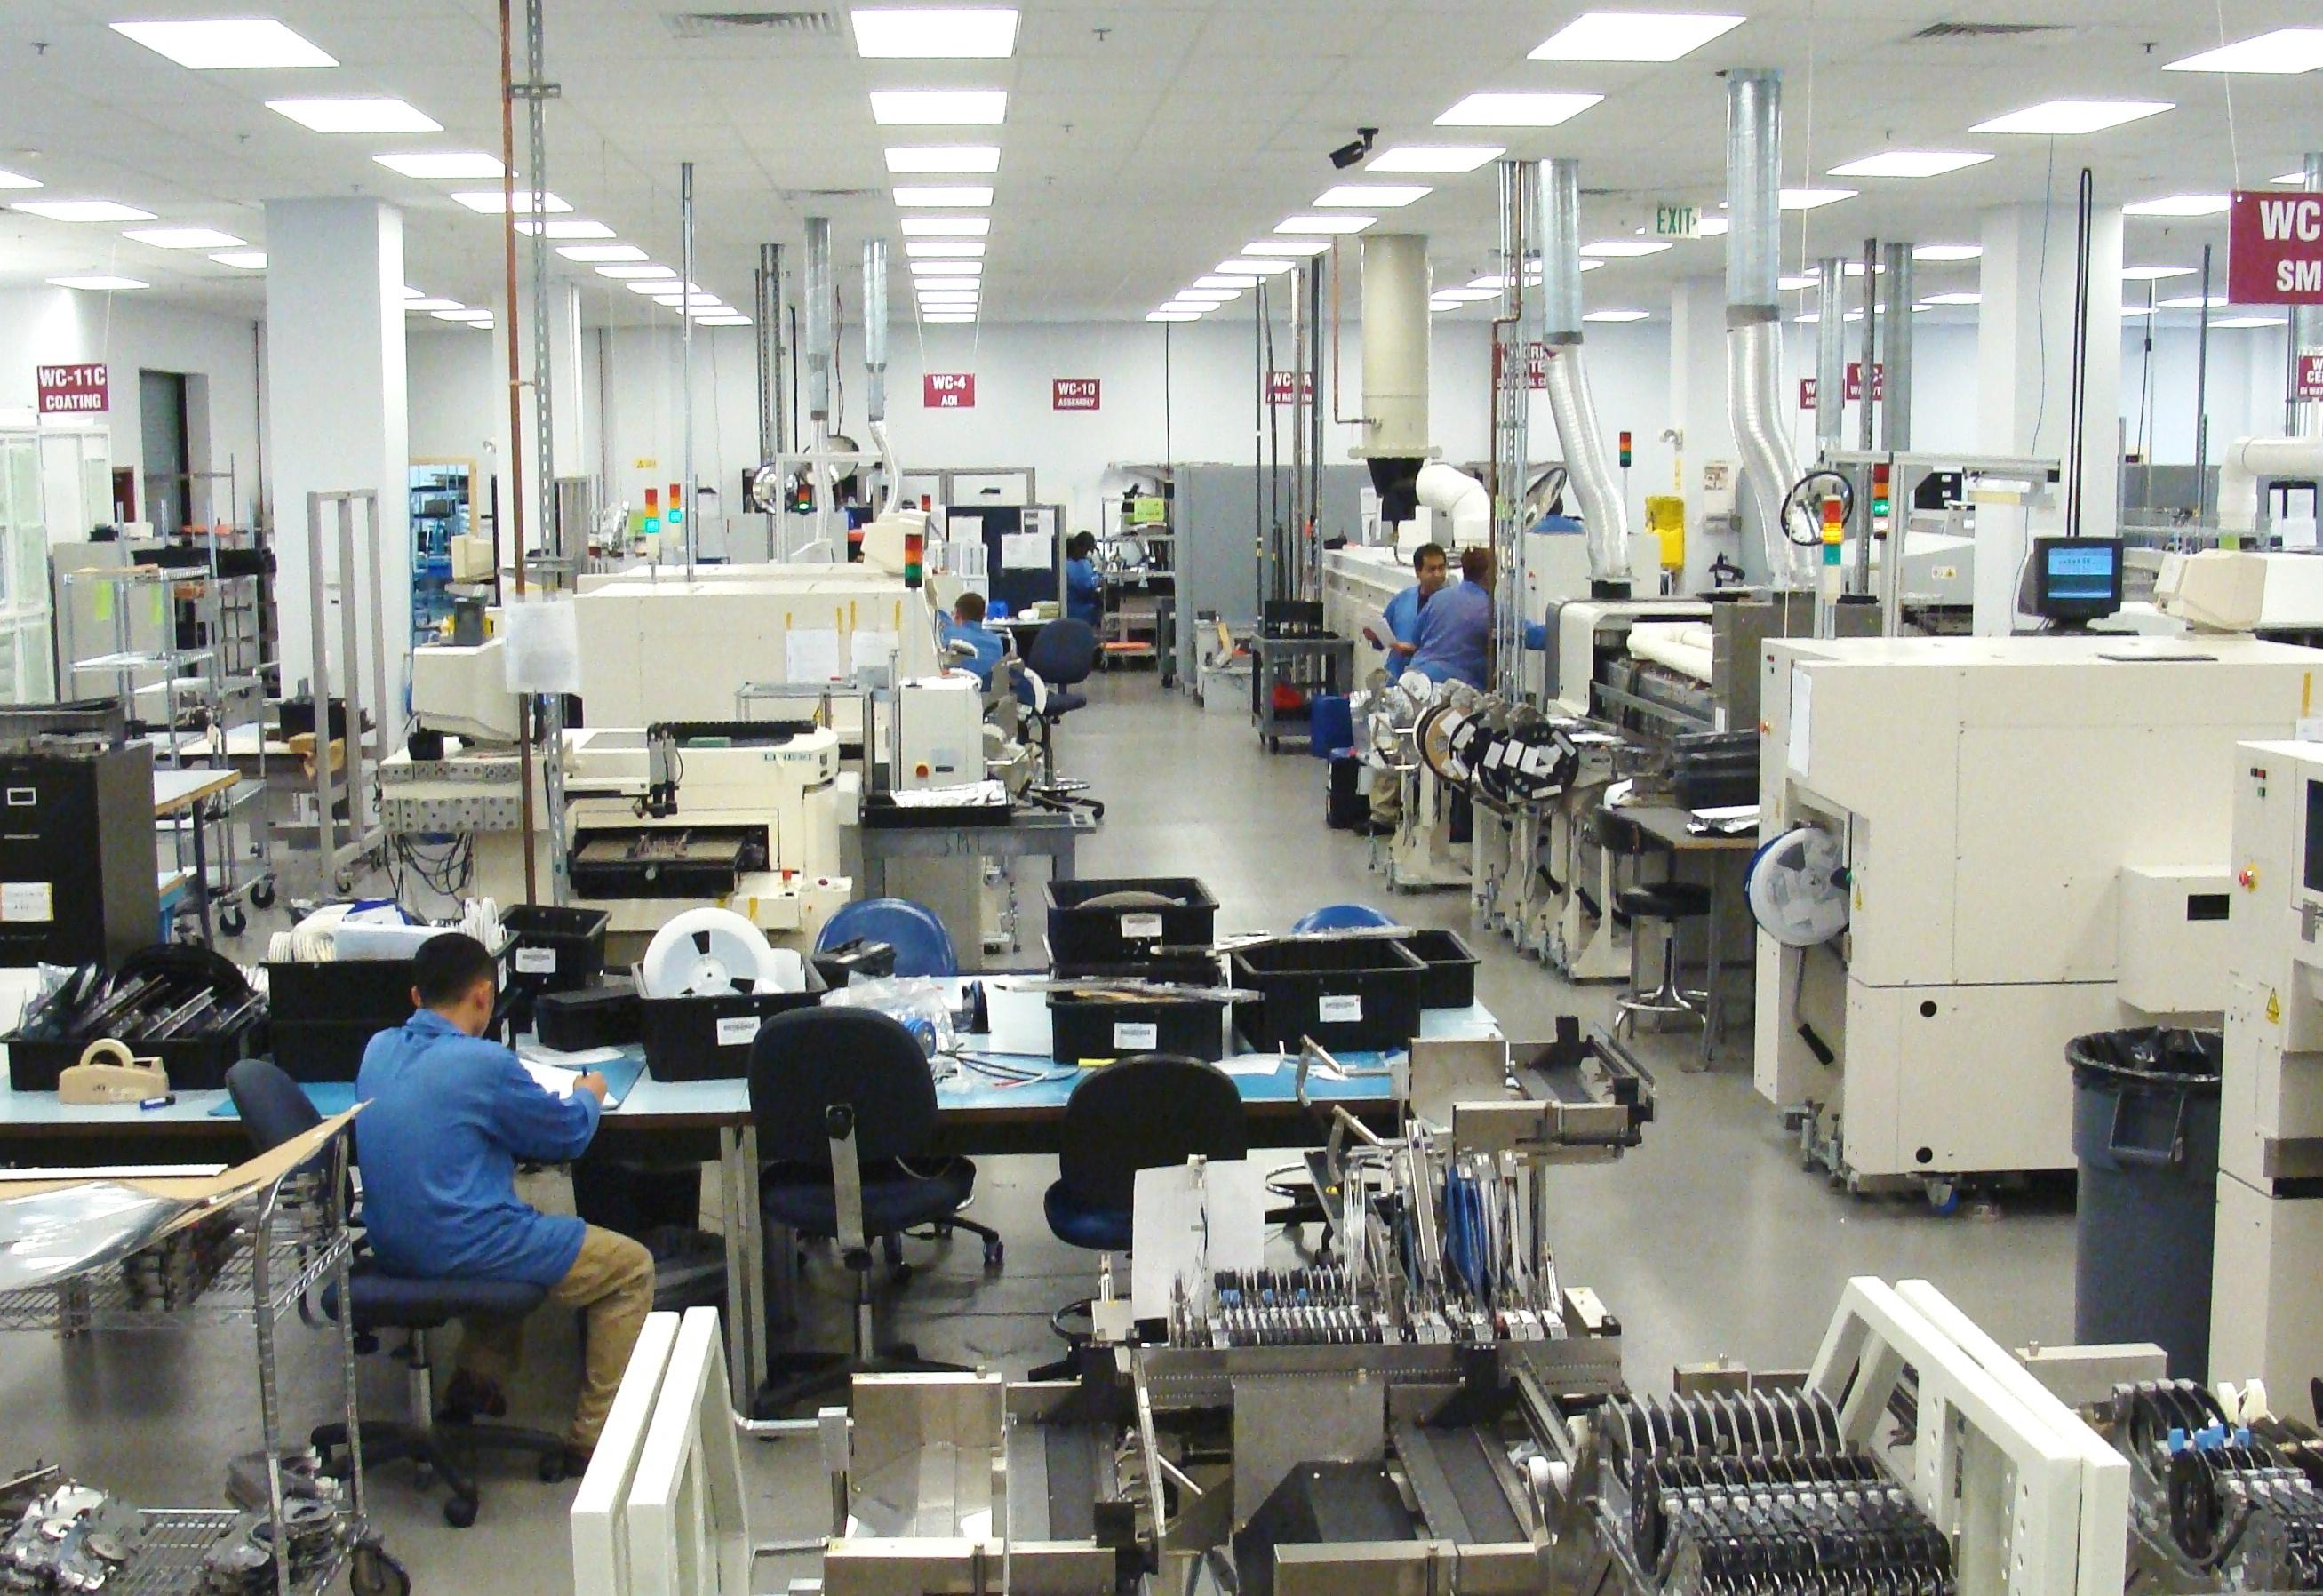 Altium Designer Preferred Schematic Capture Customer To Provide